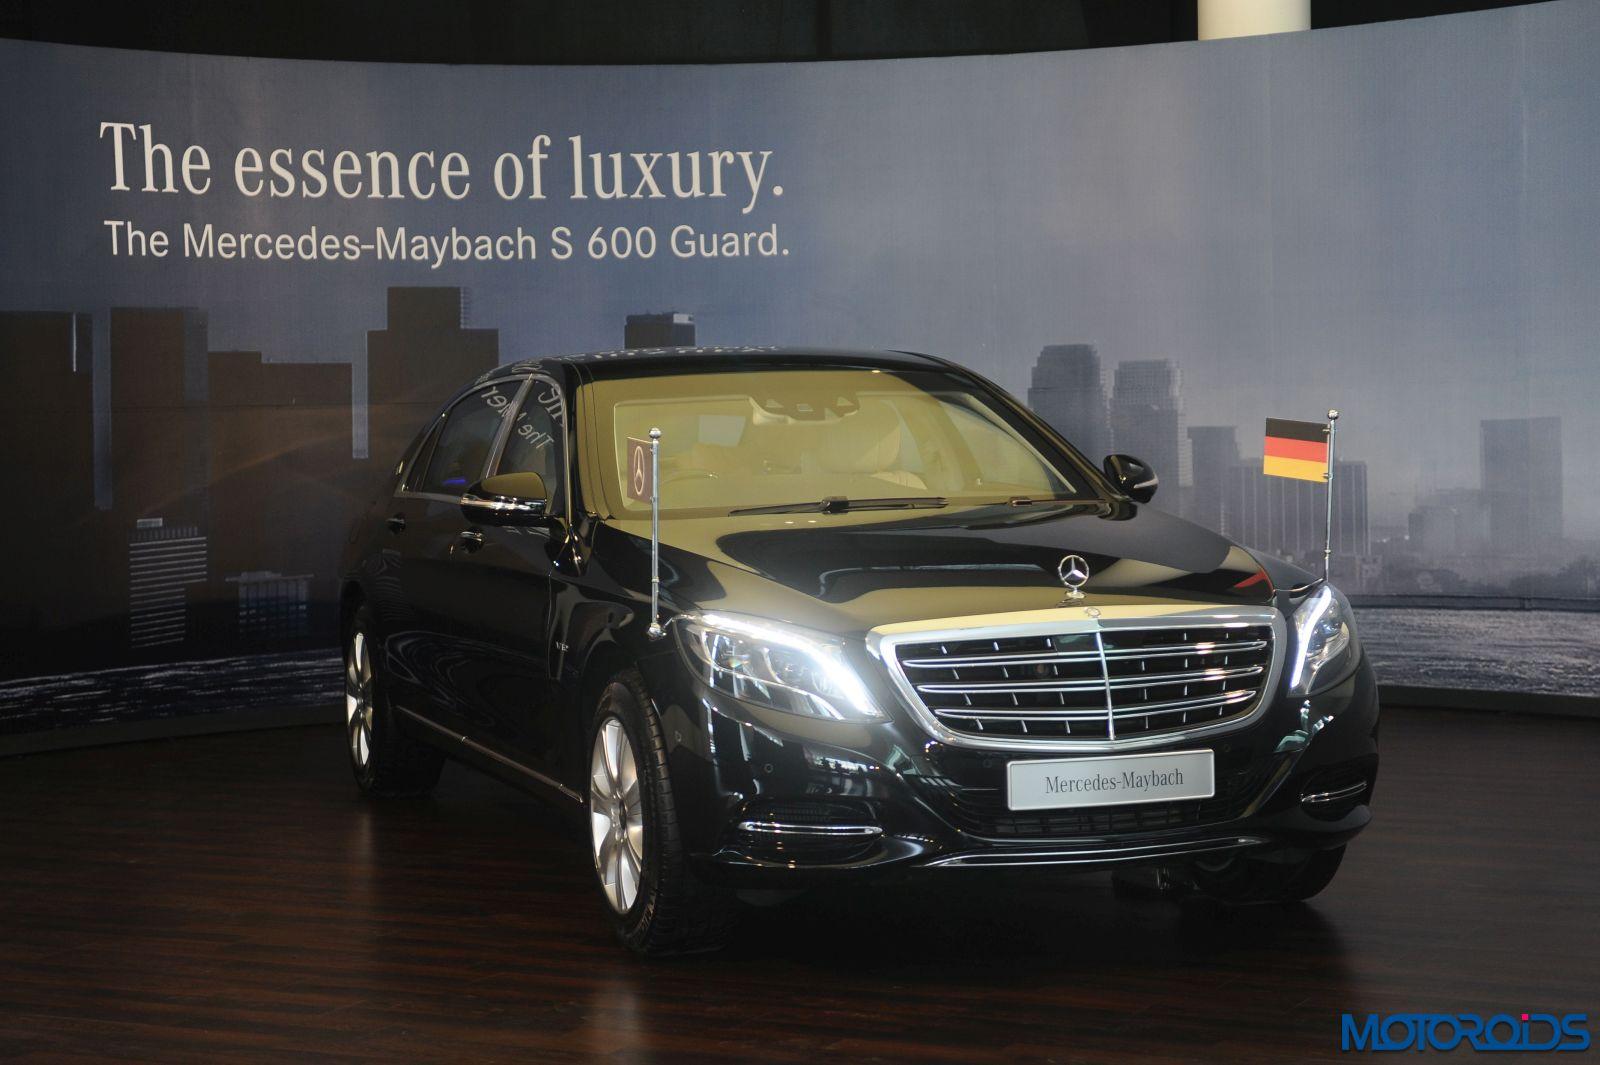 http://www.motoroids.com/wp-content/uploads/2016/03/2017-Mercedes-Maybach-S600-Guard-2.jpg